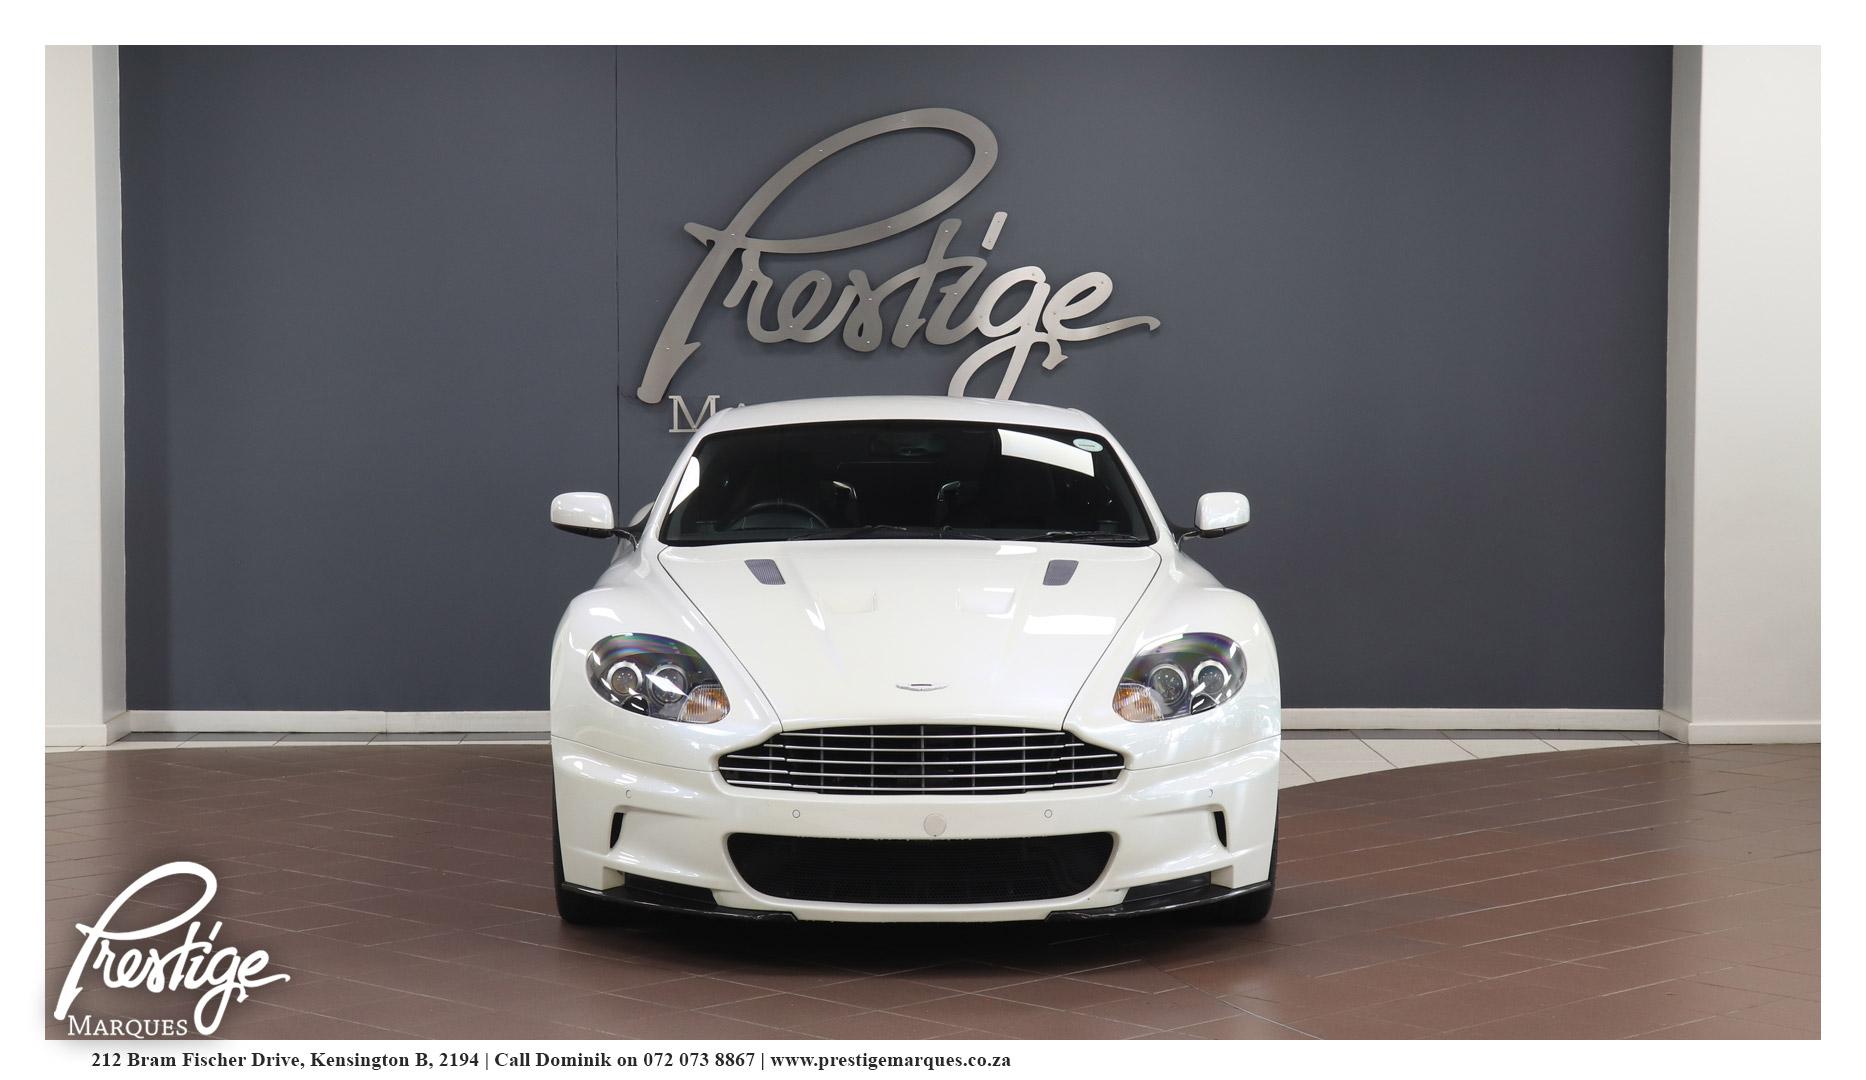 Aston-Martin-DBS-Coupe-Auto-2009-Prestige-Marques-Randburg-Sandton-9